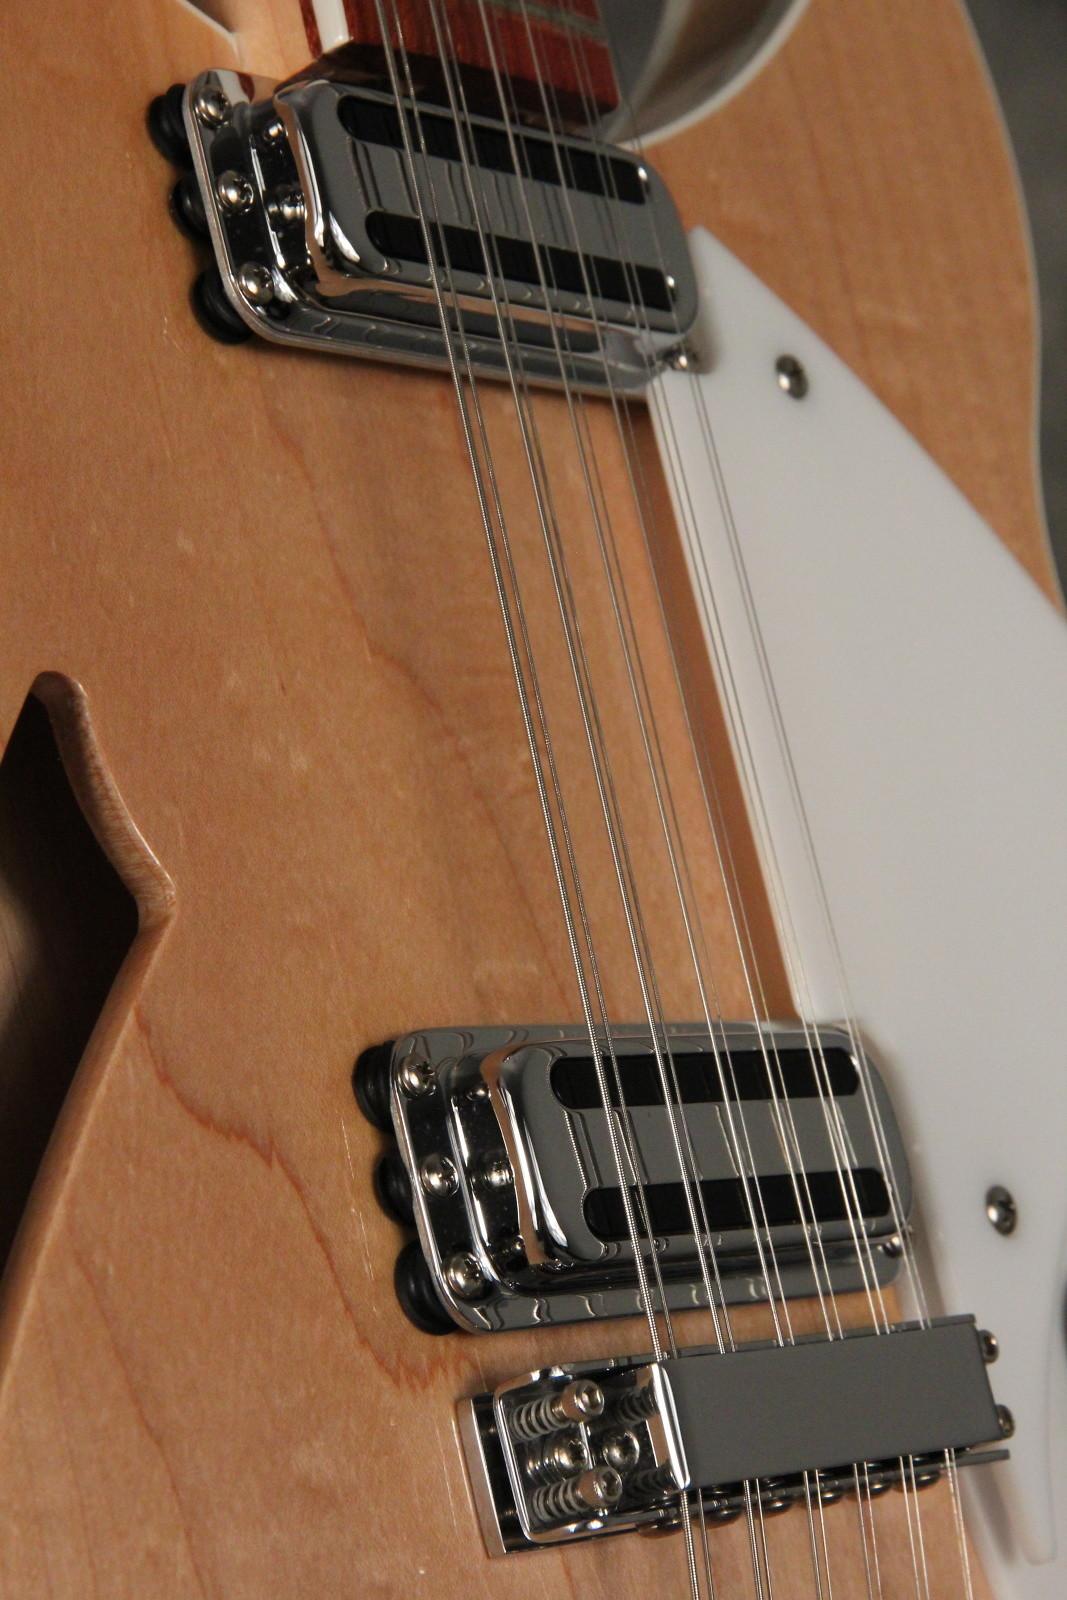 Rickenbacker360:12V64Mapleglotoasterpickups